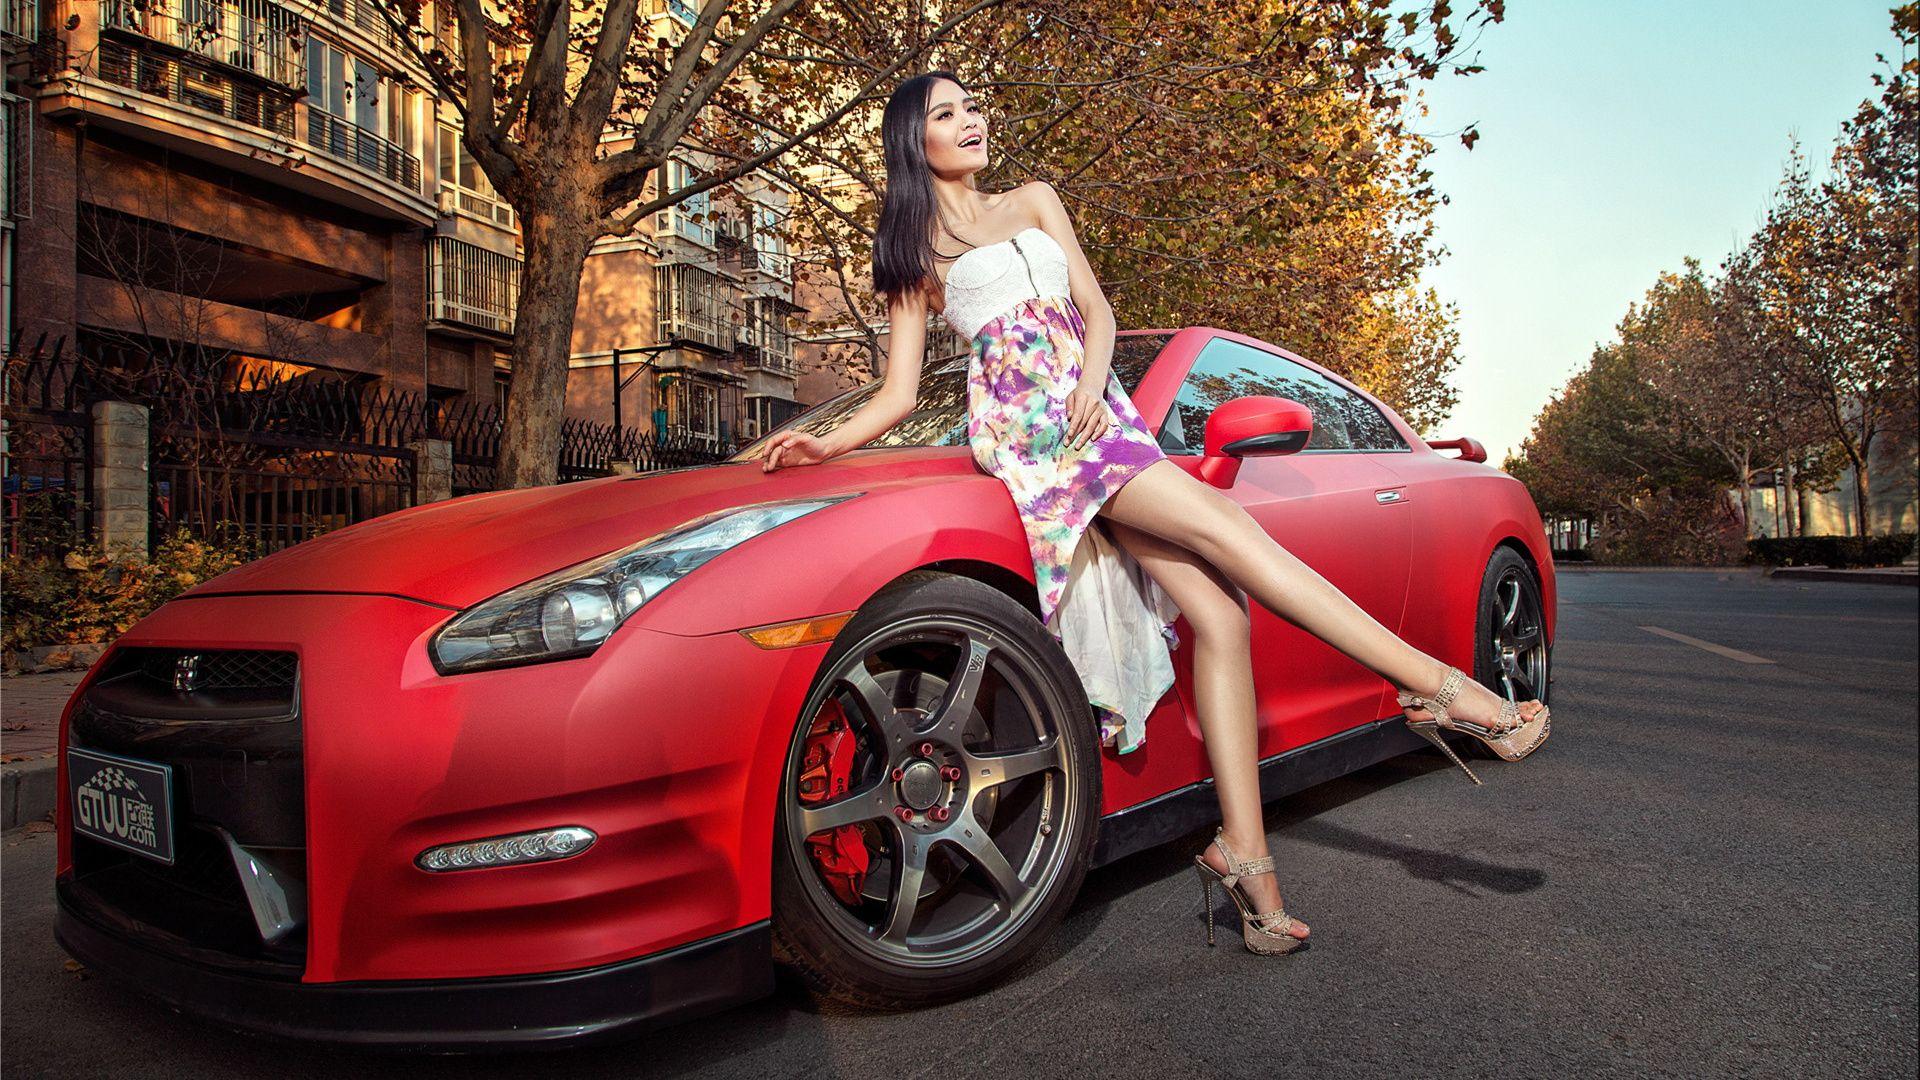 Car Girl jpg picture